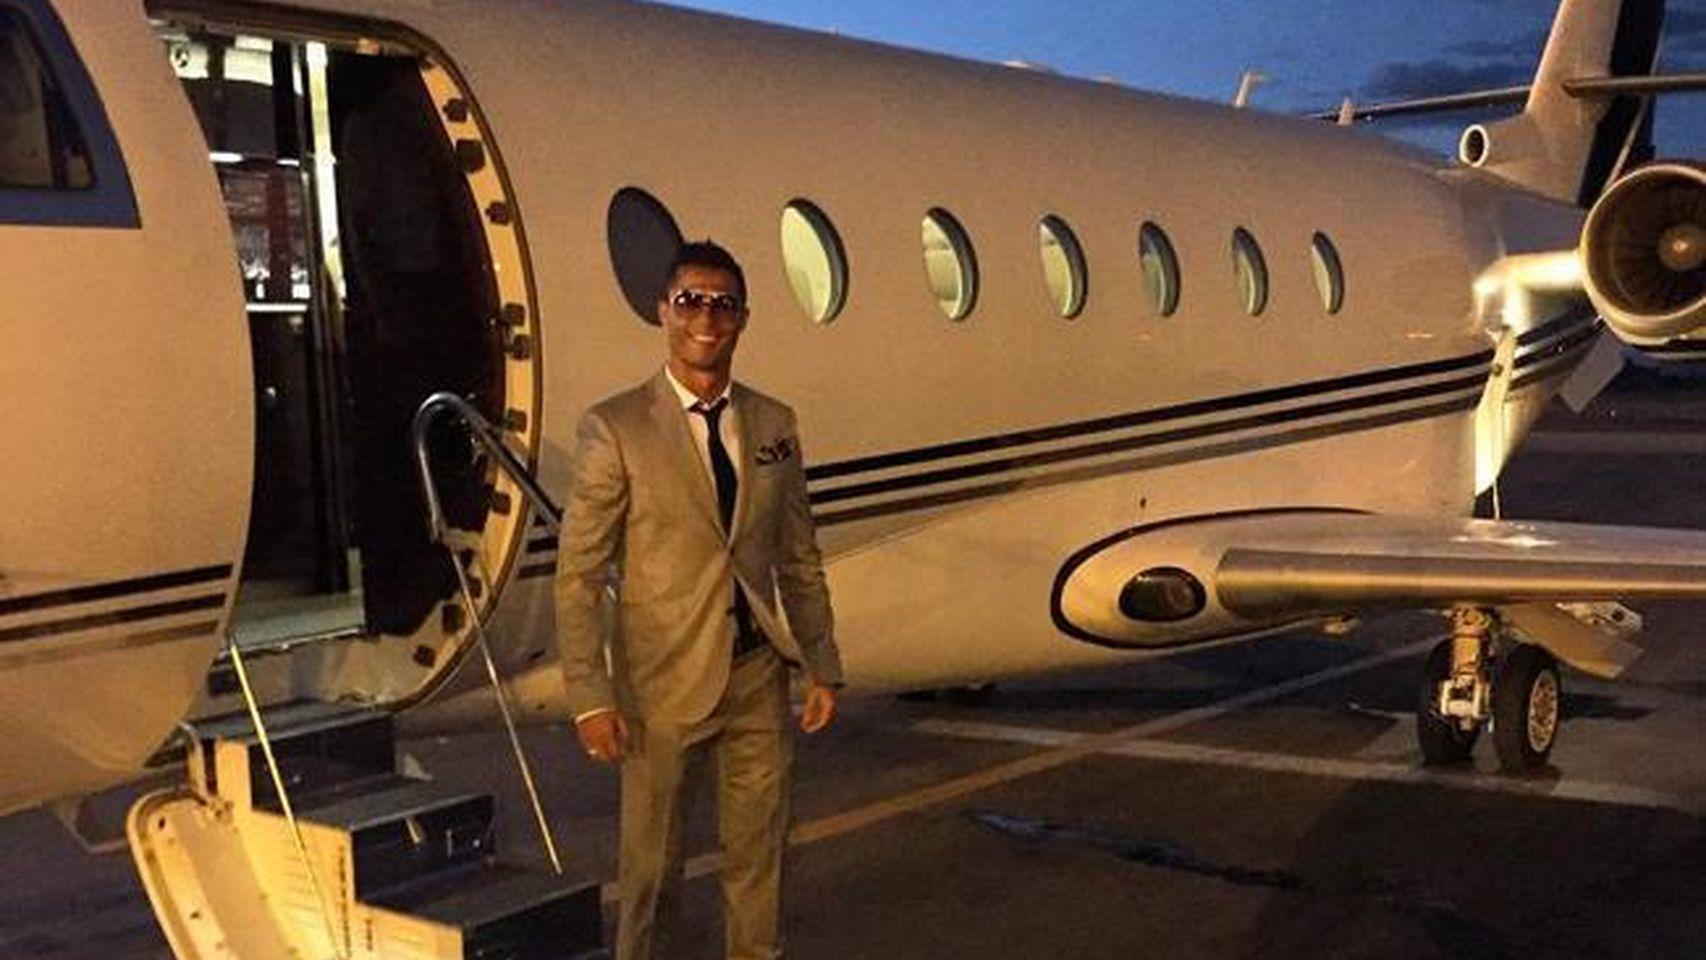 Cristiano aterriza con su jet privado en Marrakech